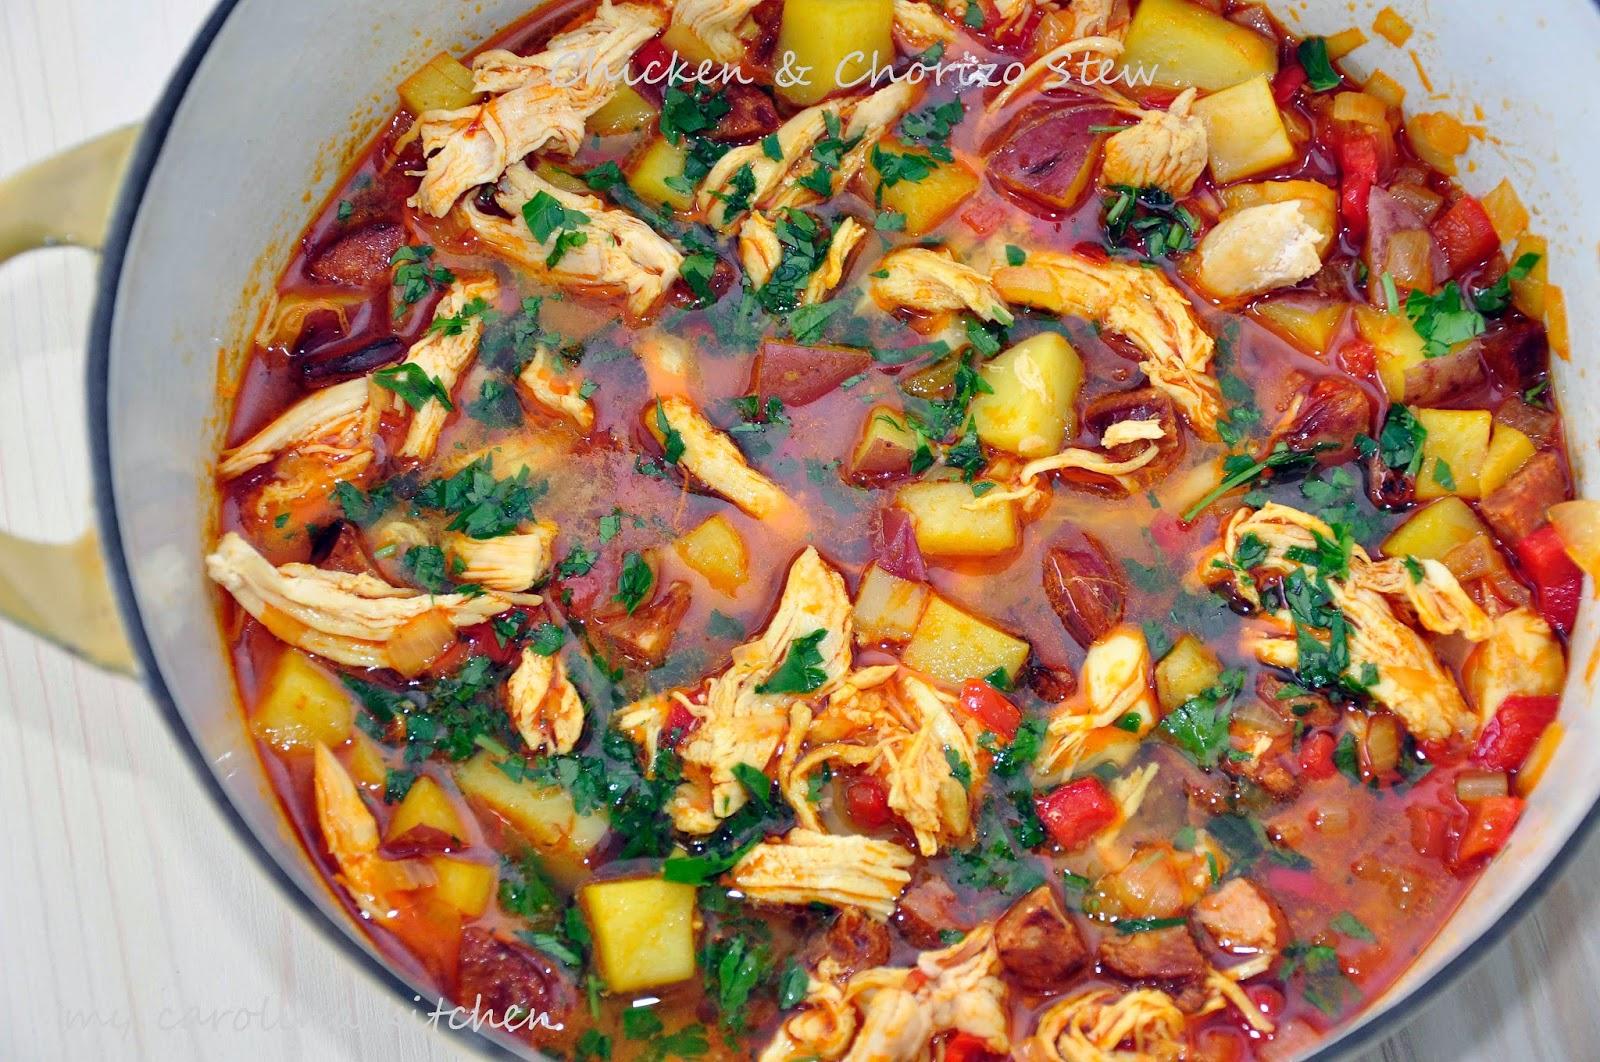 Chicken+&+chorizo+stew+8.jpg